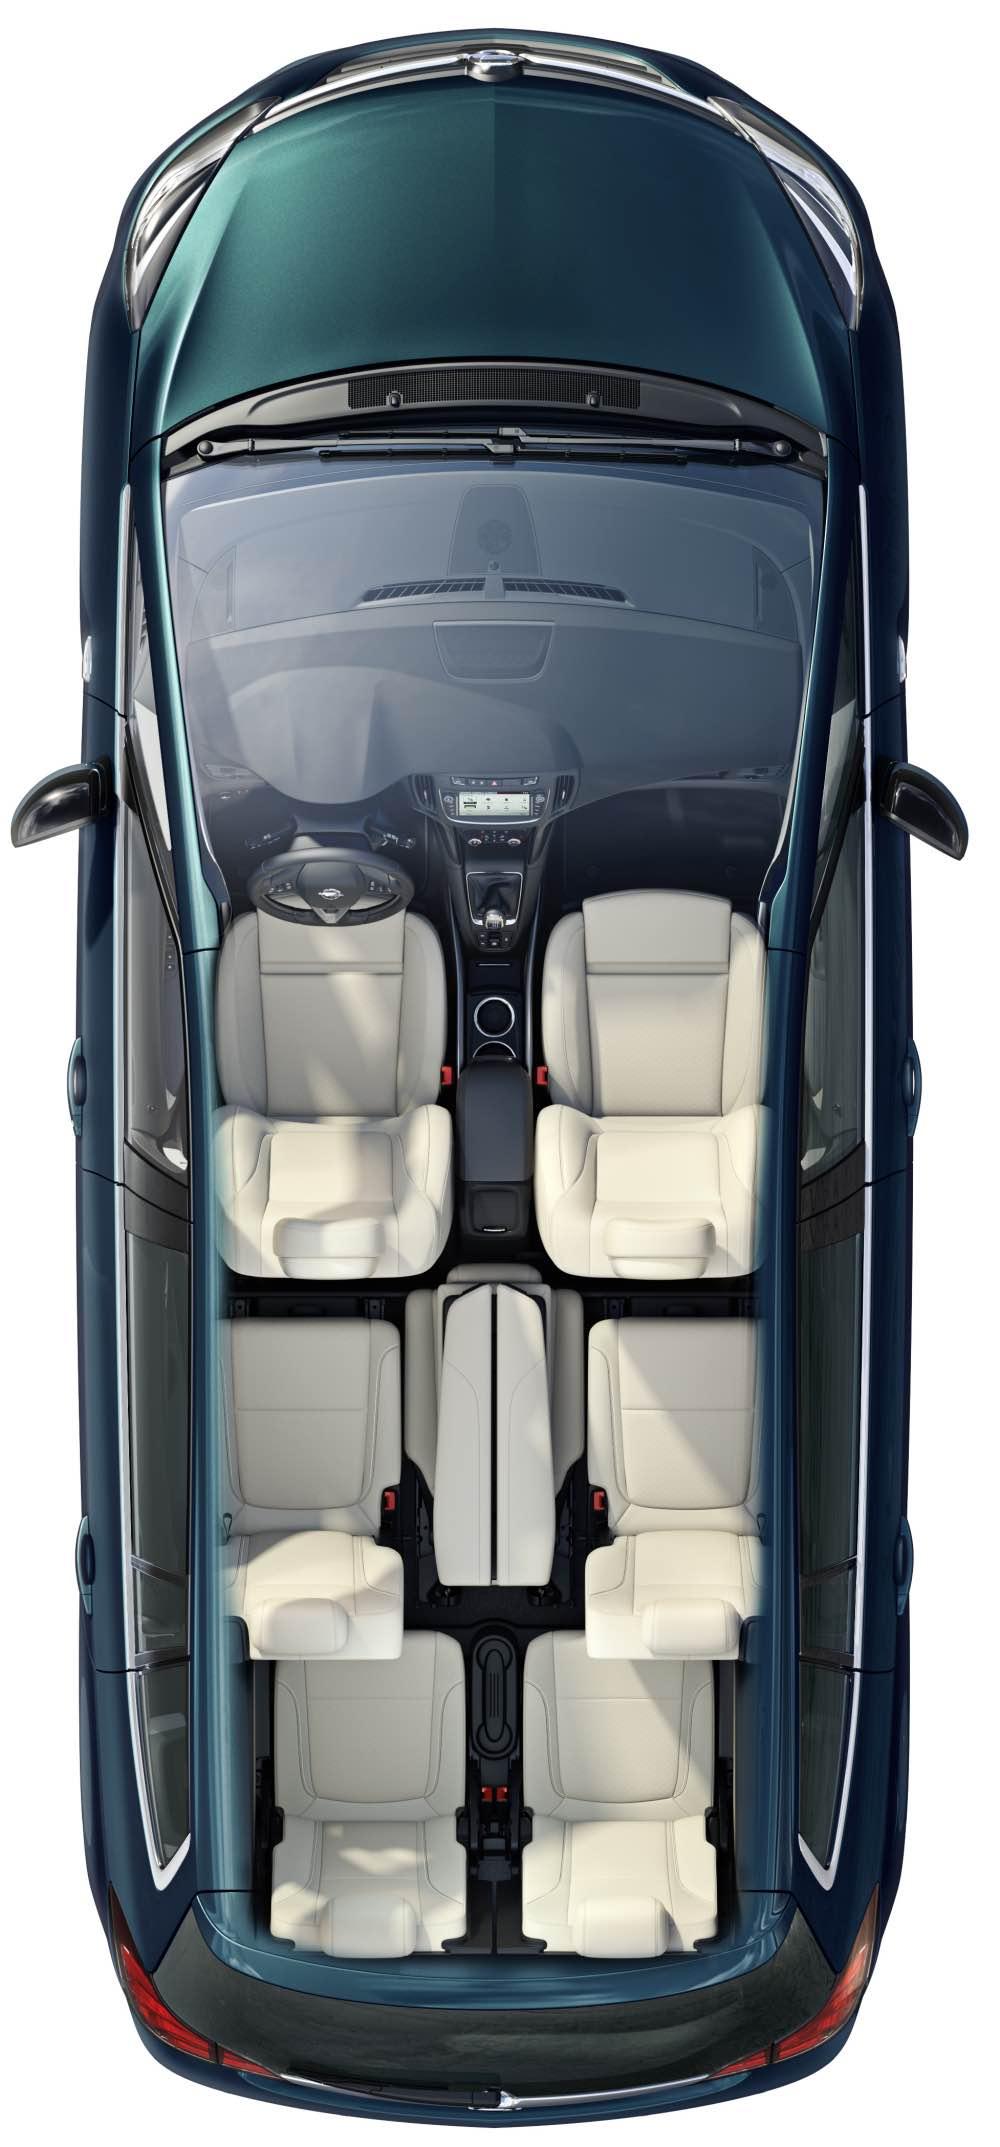 Opel Zafira Sitze OnStar